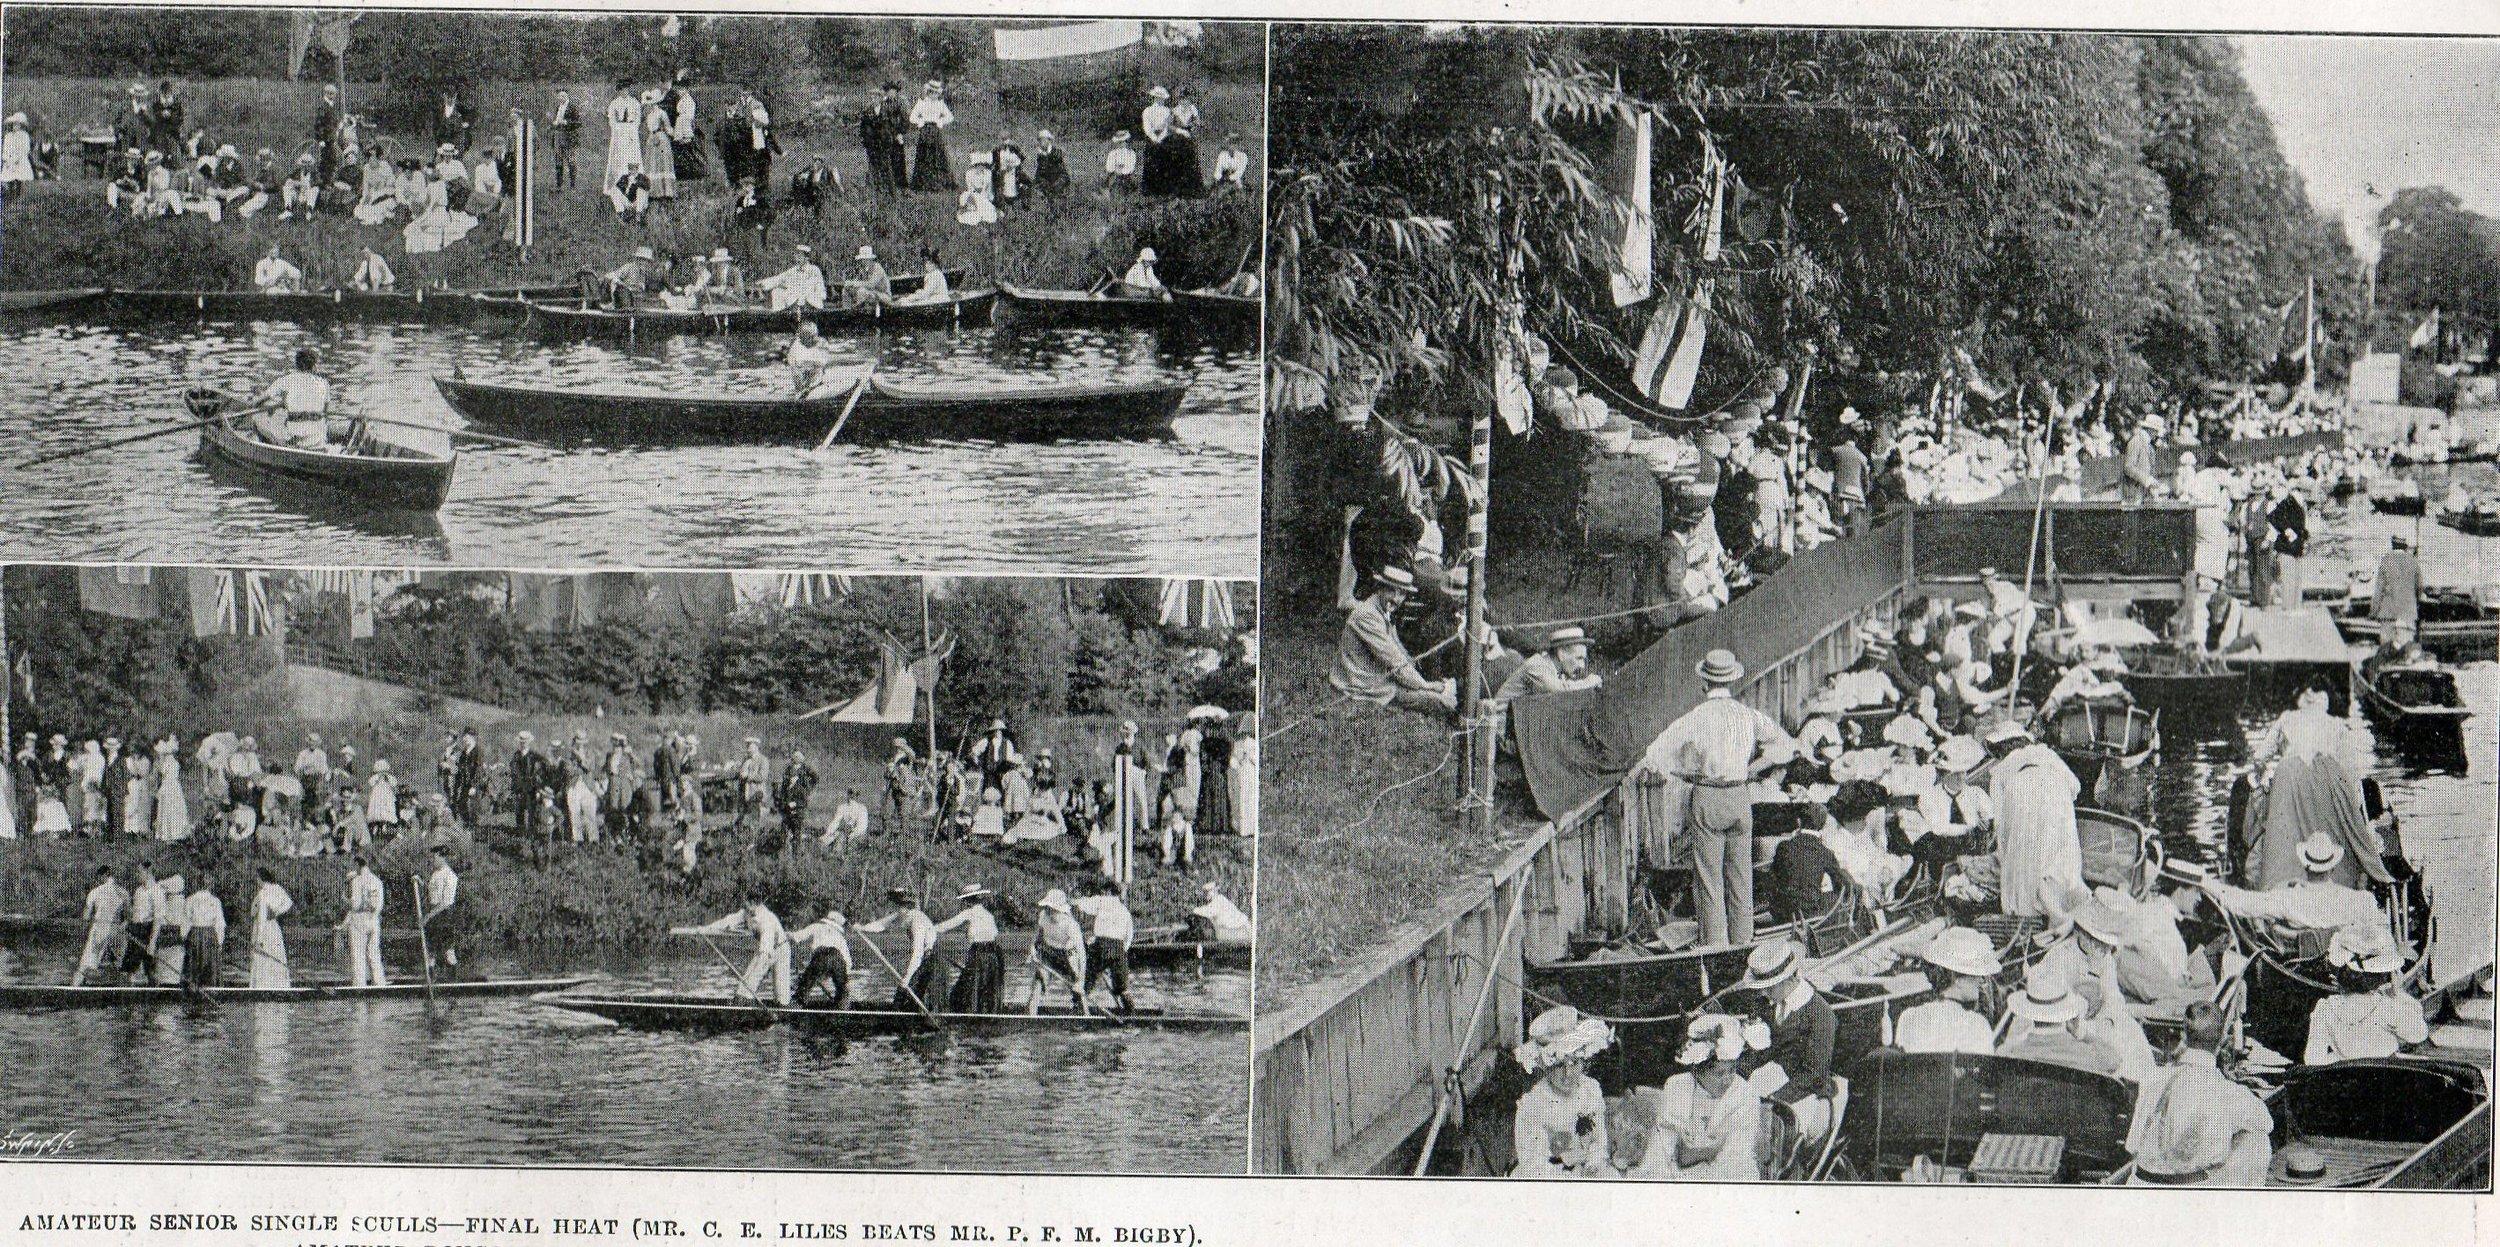 Regatta 1901.jpg